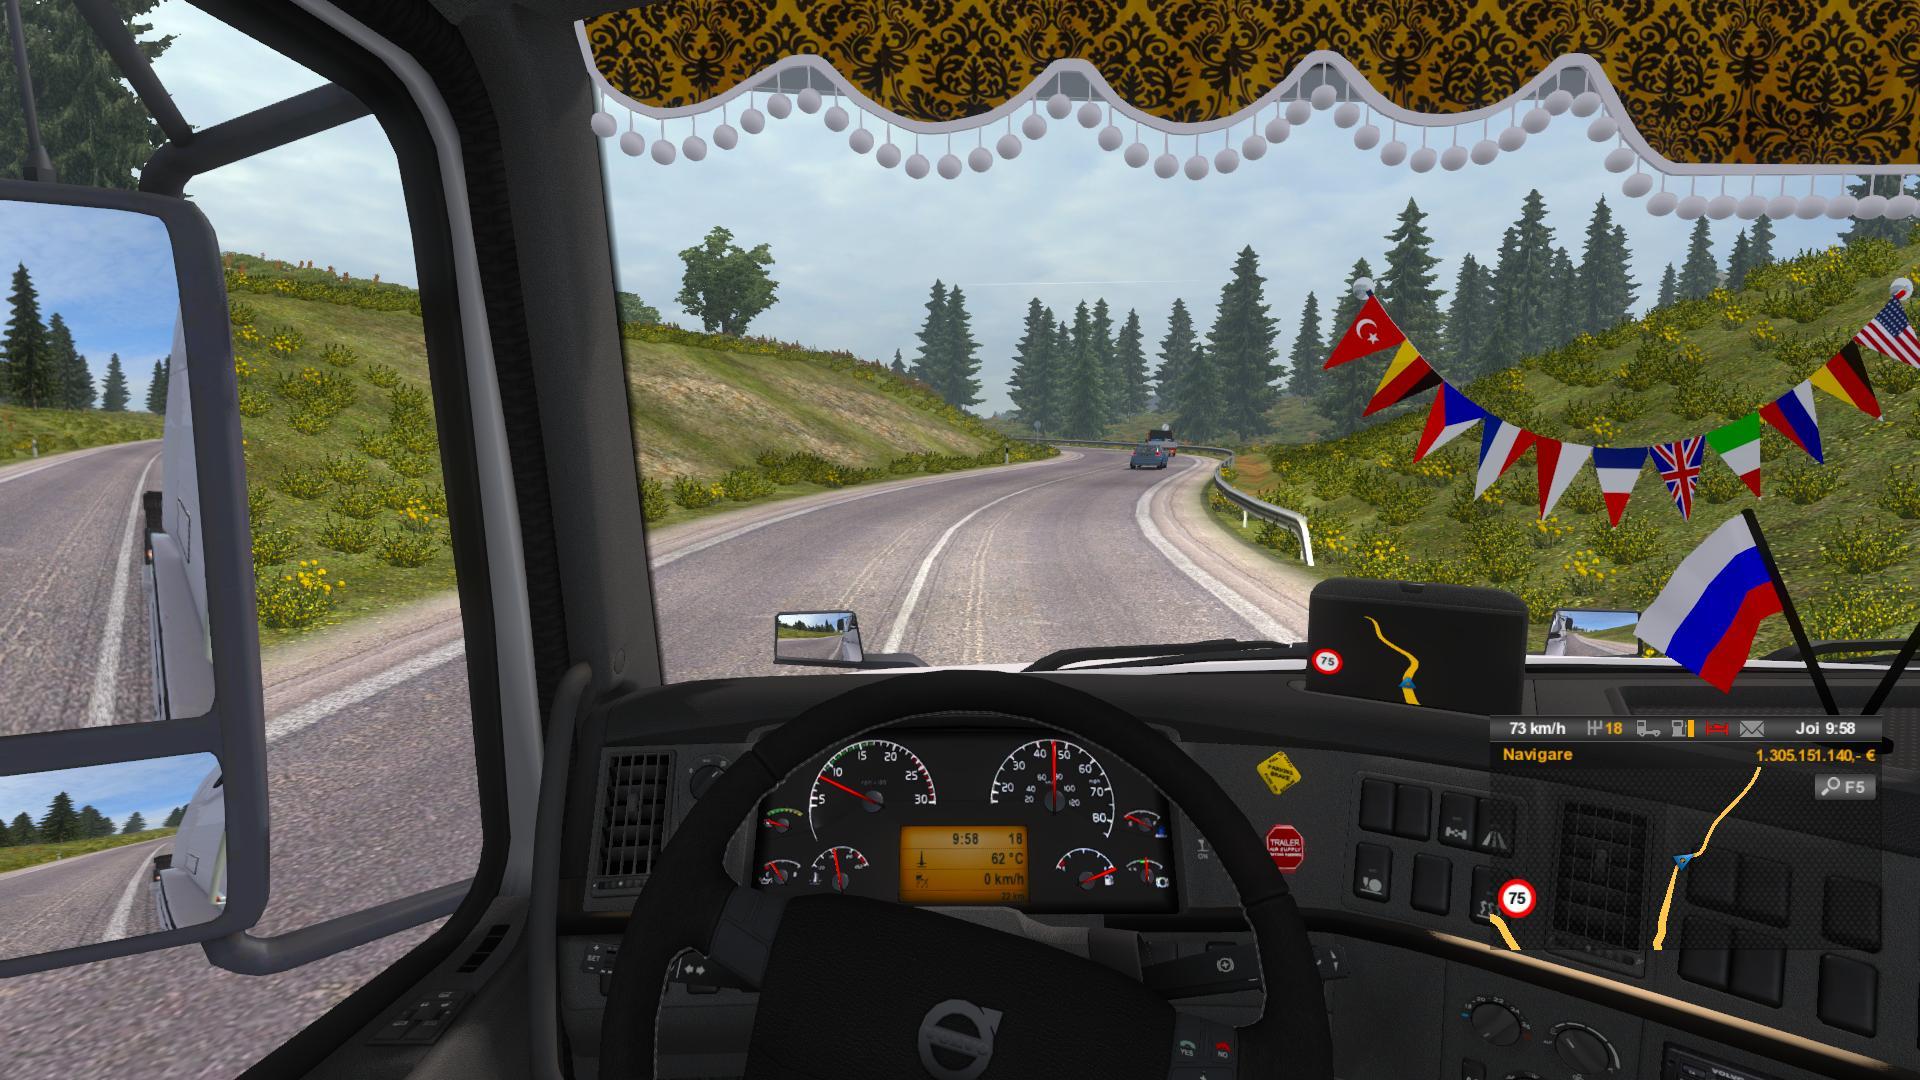 VOLVO VNL 670 1.23 Truck -Euro Truck Simulator 2 Mods